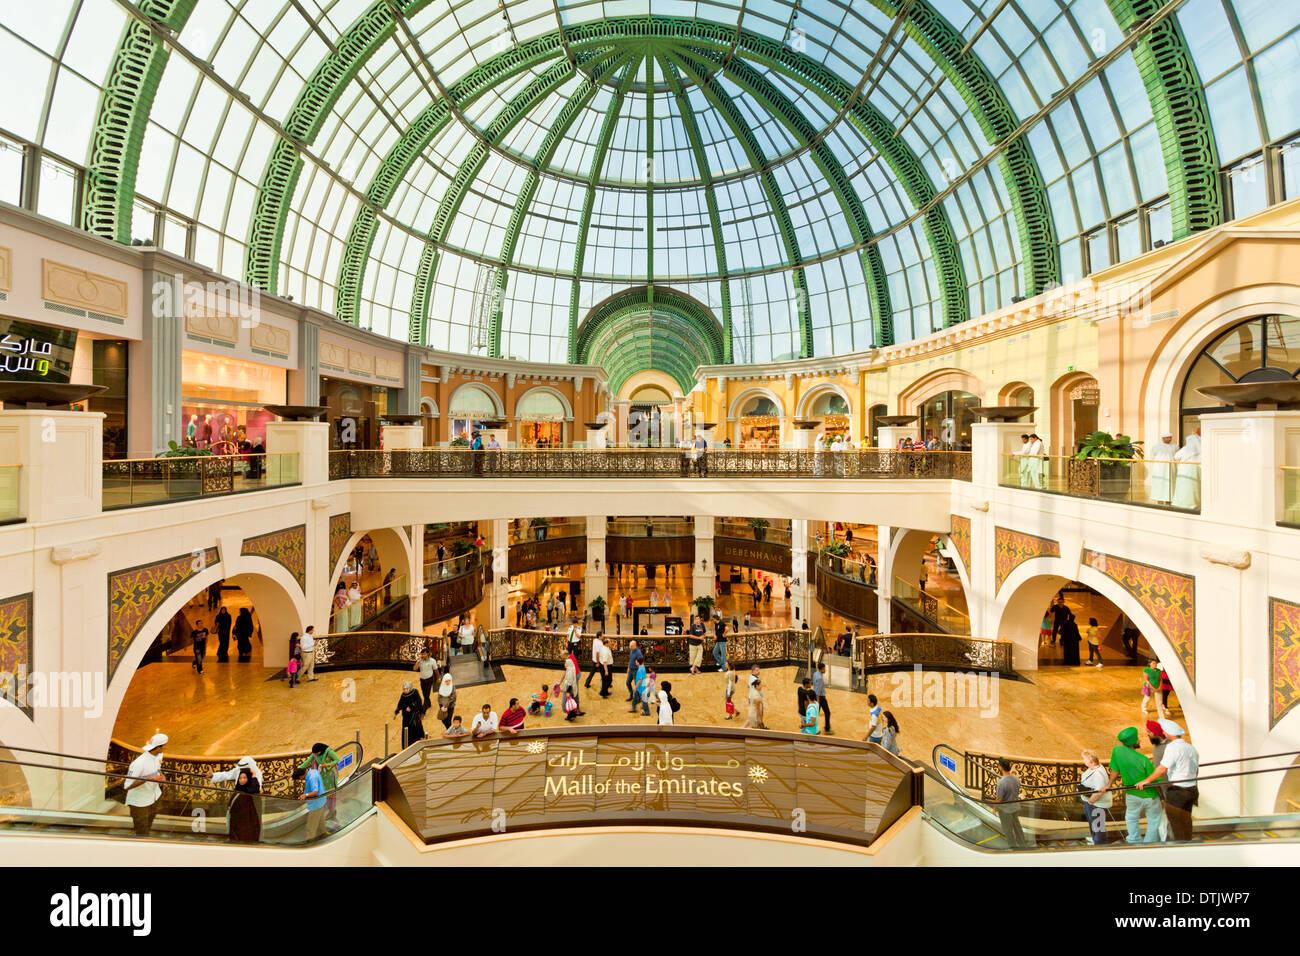 Interior of the Mall of the Emirates Dubai Shopping Mall, Dubai, United Arab Emirates, UAE middle east - Stock Image